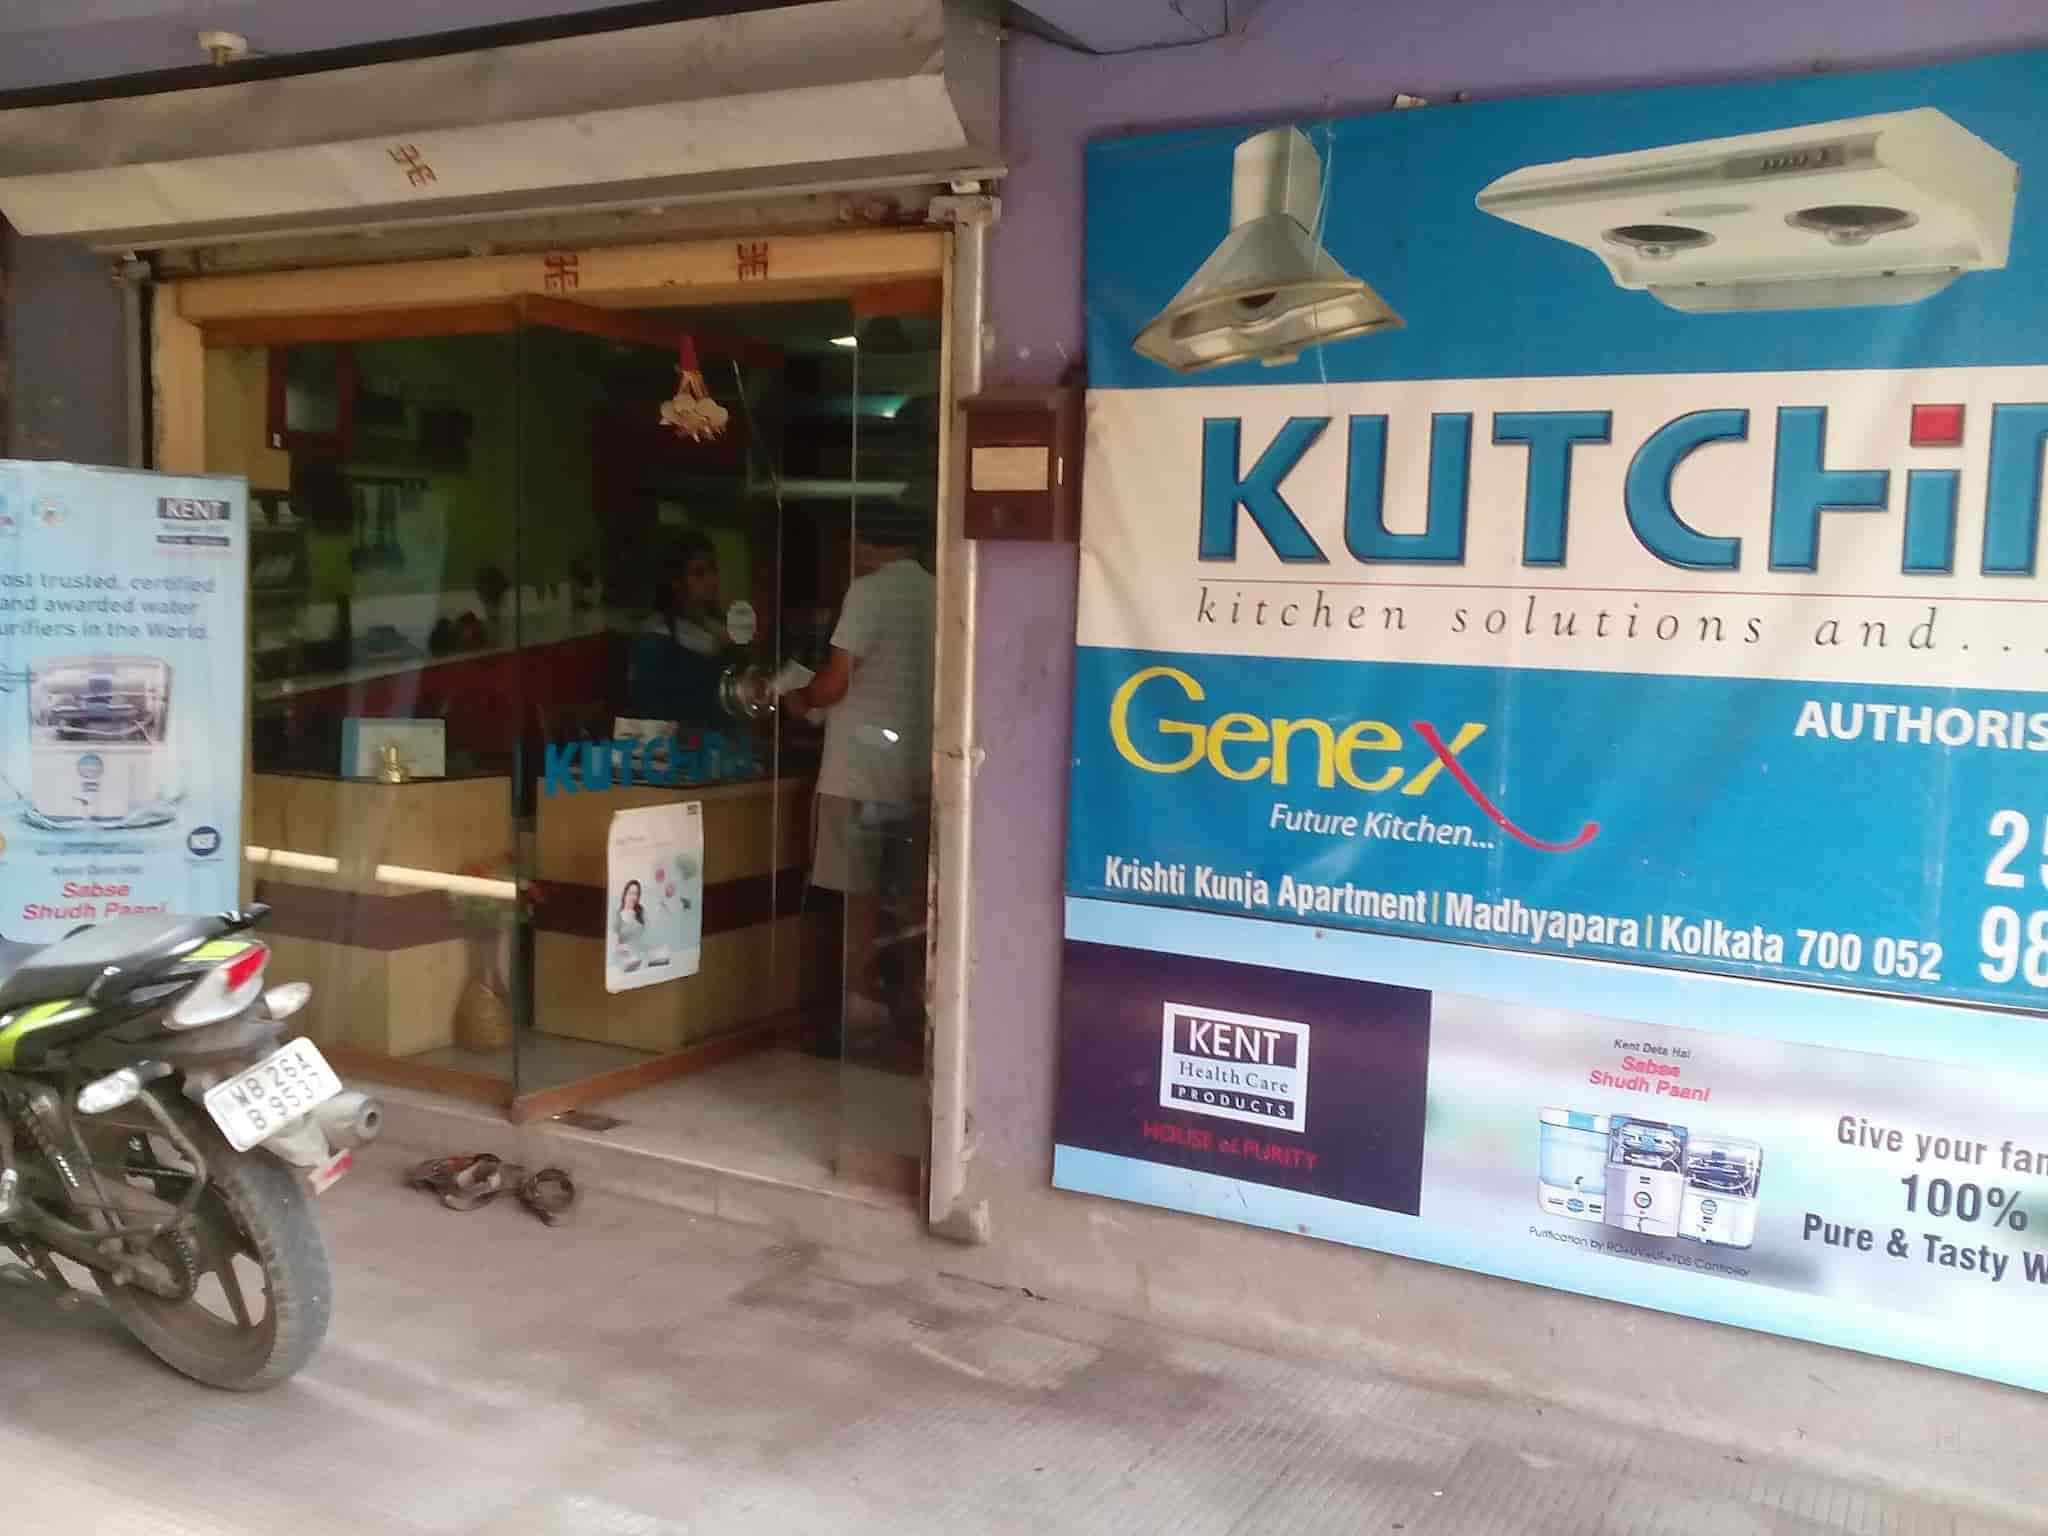 Faber Kitchen Chimney Dealers In Coimbatore - Best Chimney 2018